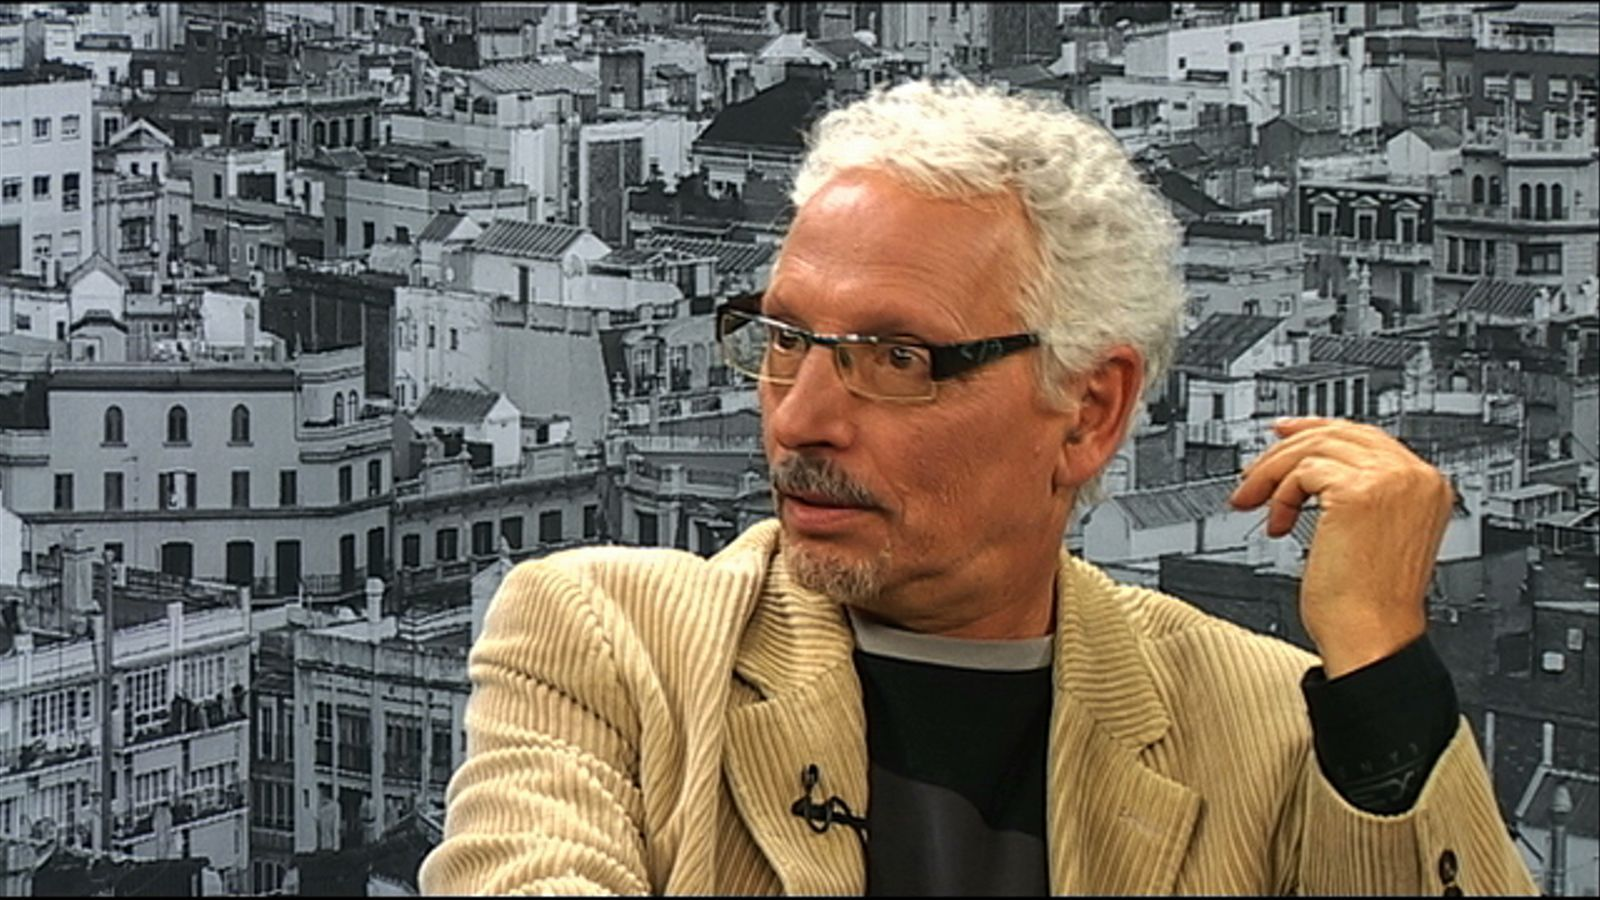 Entrevista d'Antoni Bassas a Santiago Vidal